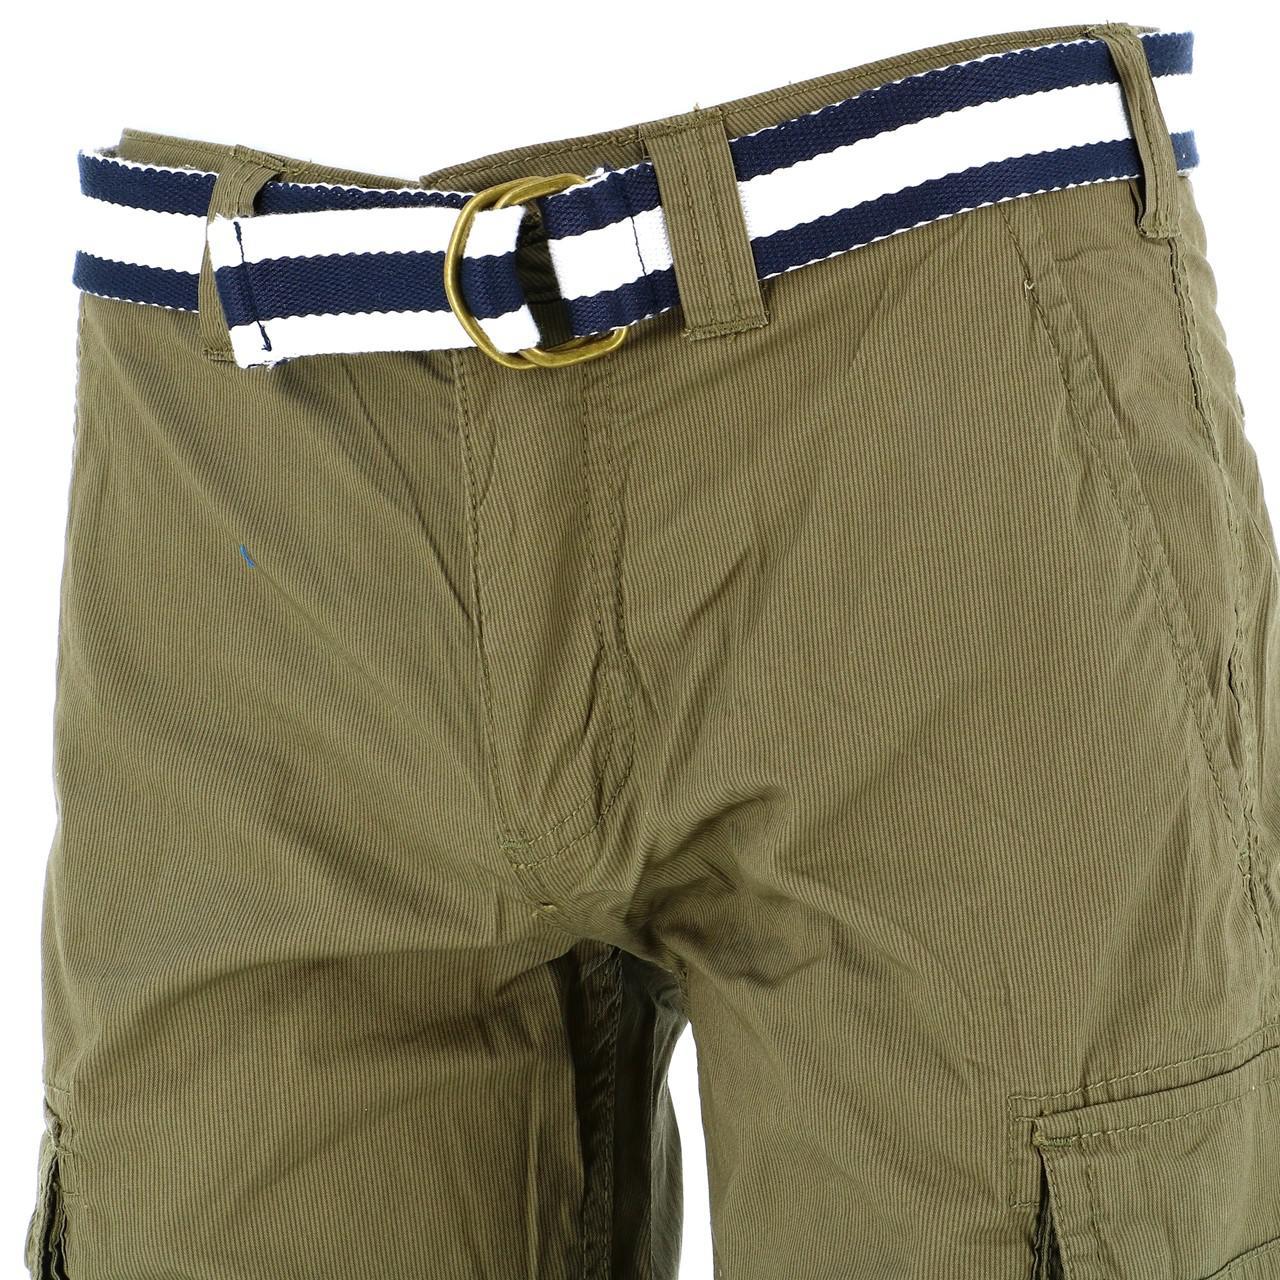 Bermuda-Shorts-Teddy-smith-Sytro-Khaki-Shorts-Jr-Green-18199-New thumbnail 4